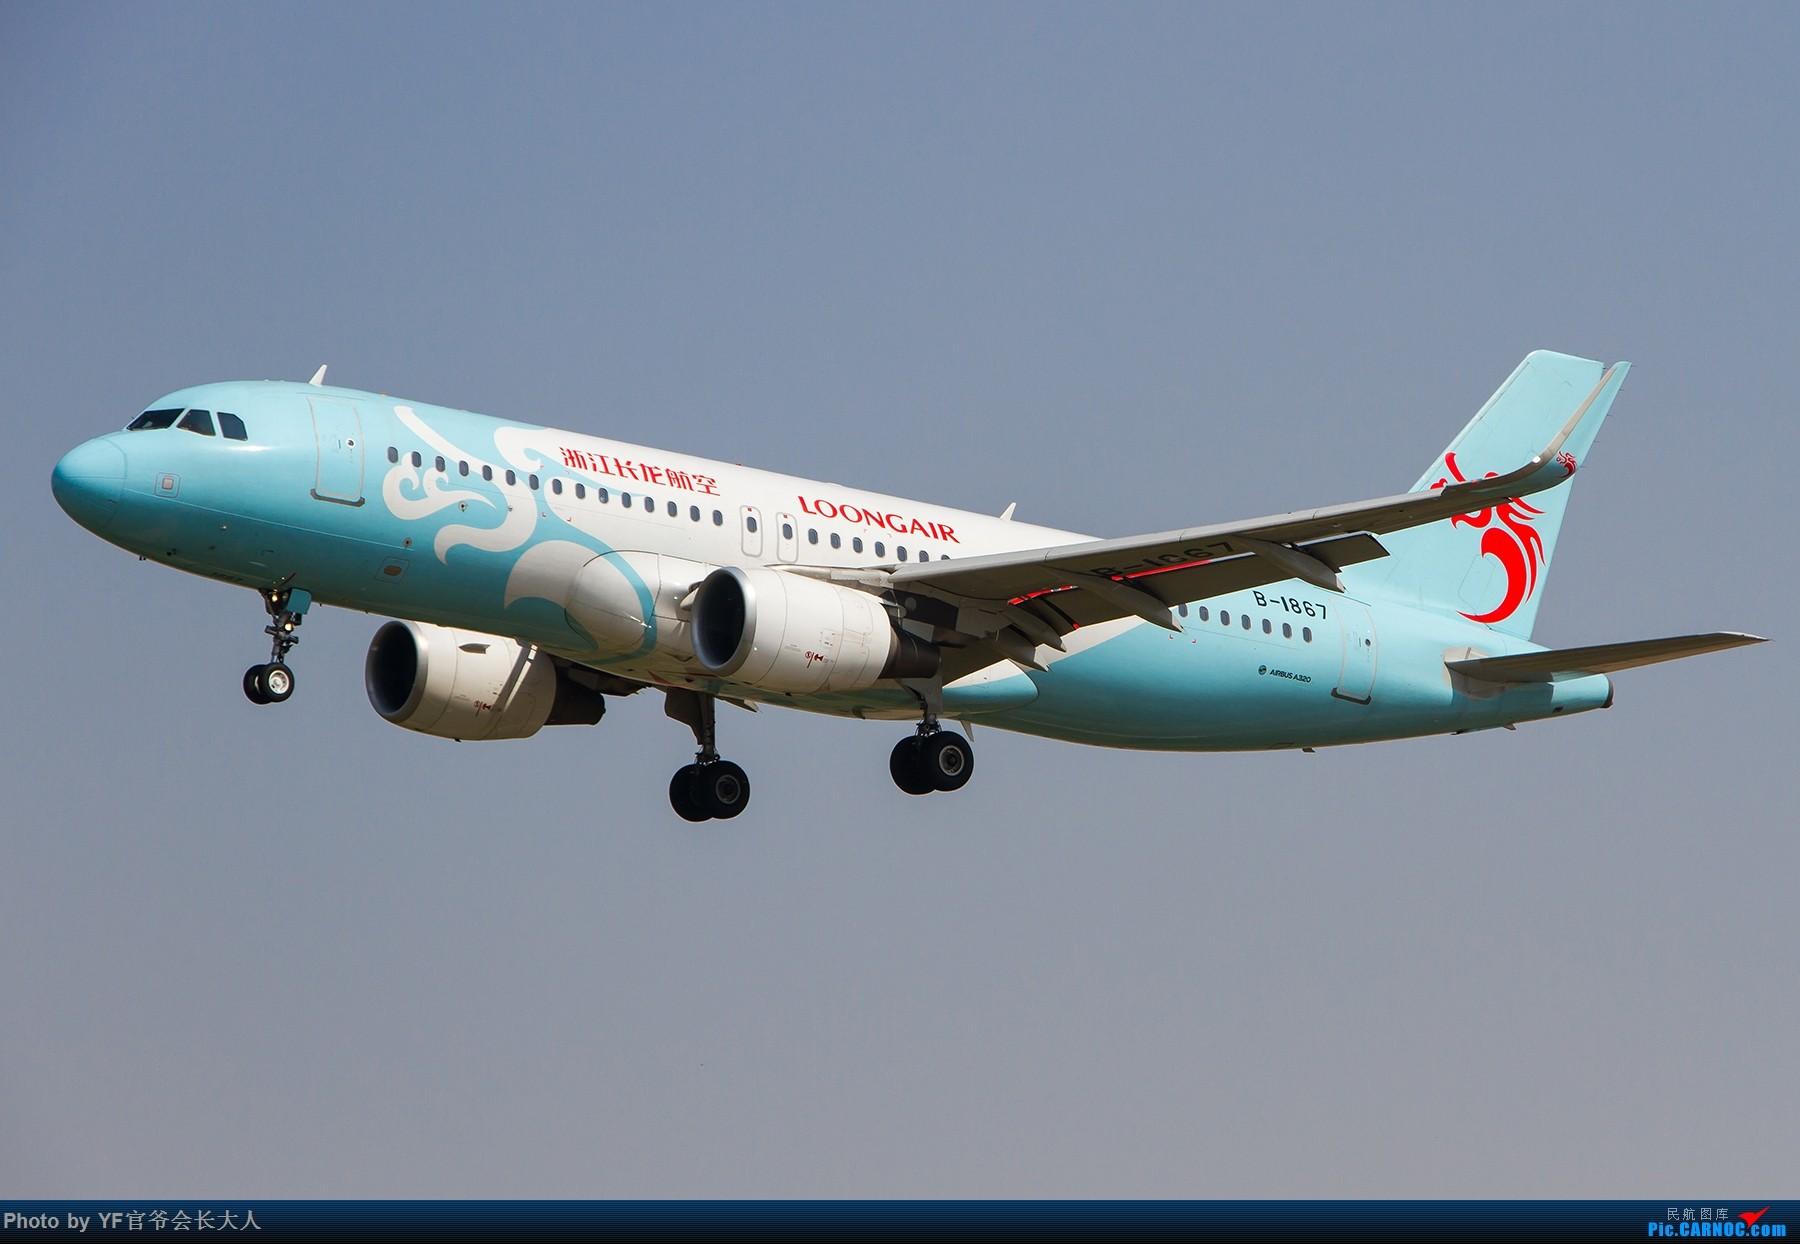 Re:[原创]【ZYTX】轻易不拍机,拍就要拍个过瘾!(新开的酷鸟,亚洲大西洋,顺带碰上朝韩两国的好货) AIRBUS A320-200 B-1867 中国沈阳桃仙国际机场